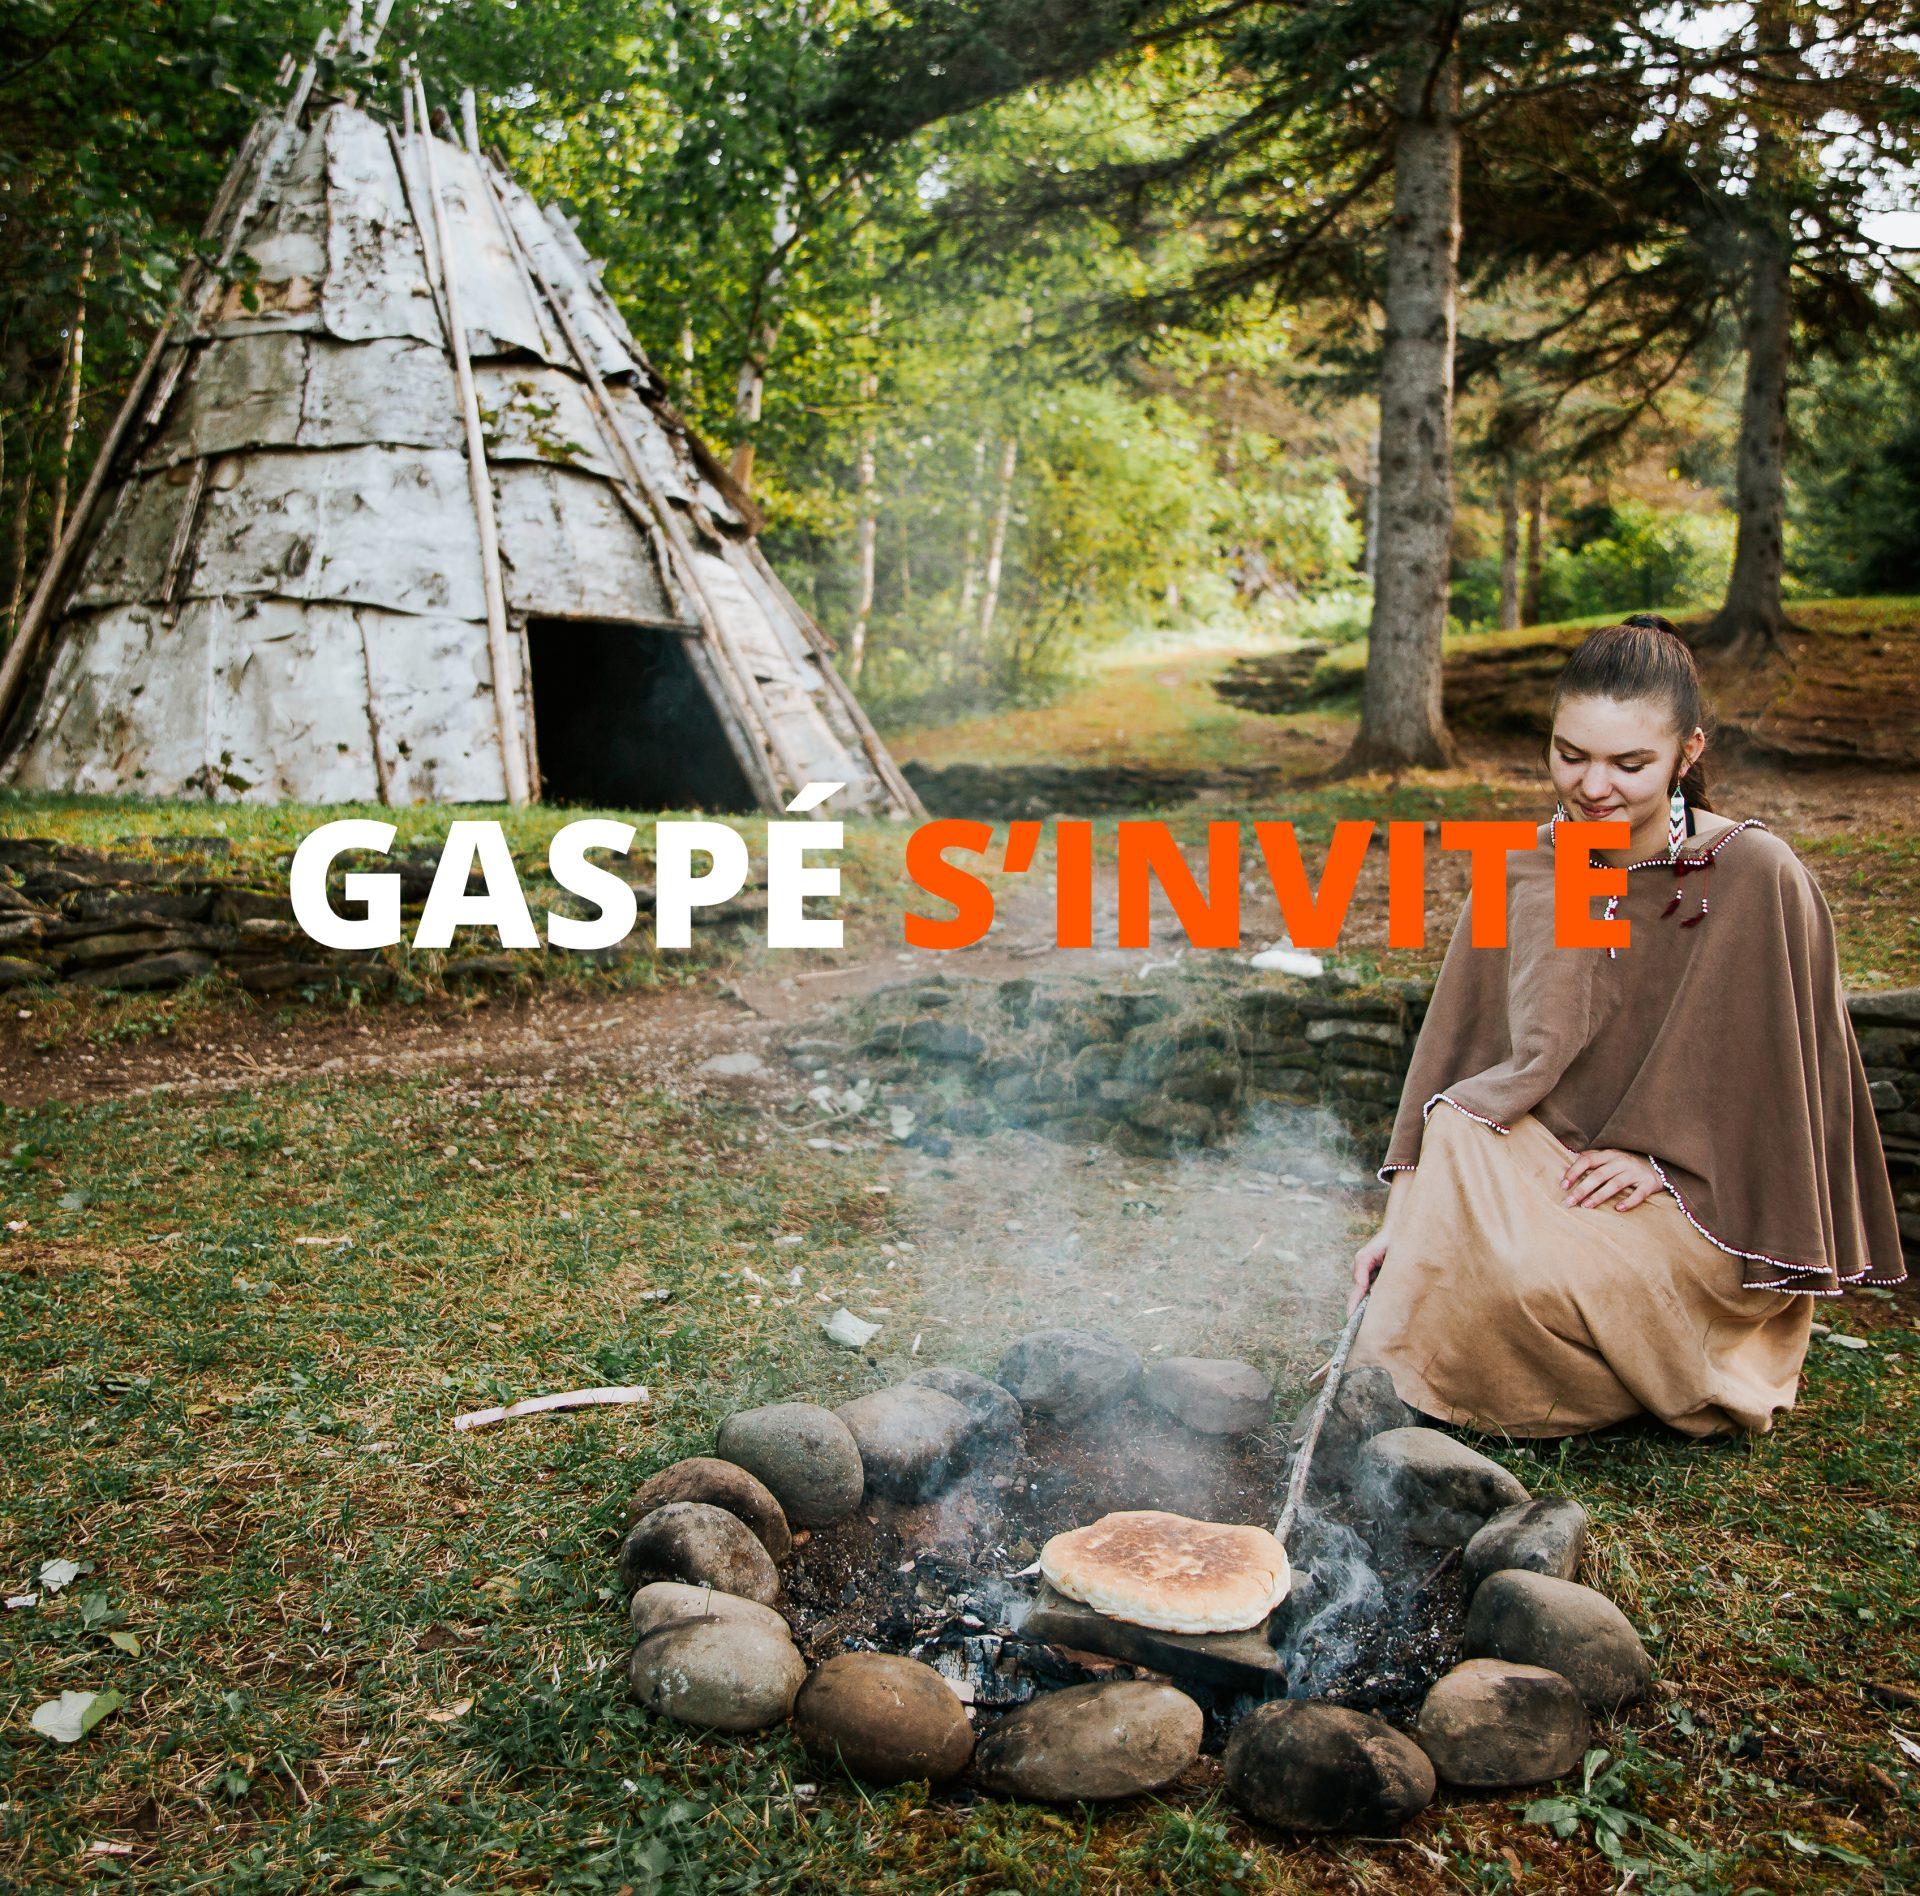 Gaspé s'invite : La bannique